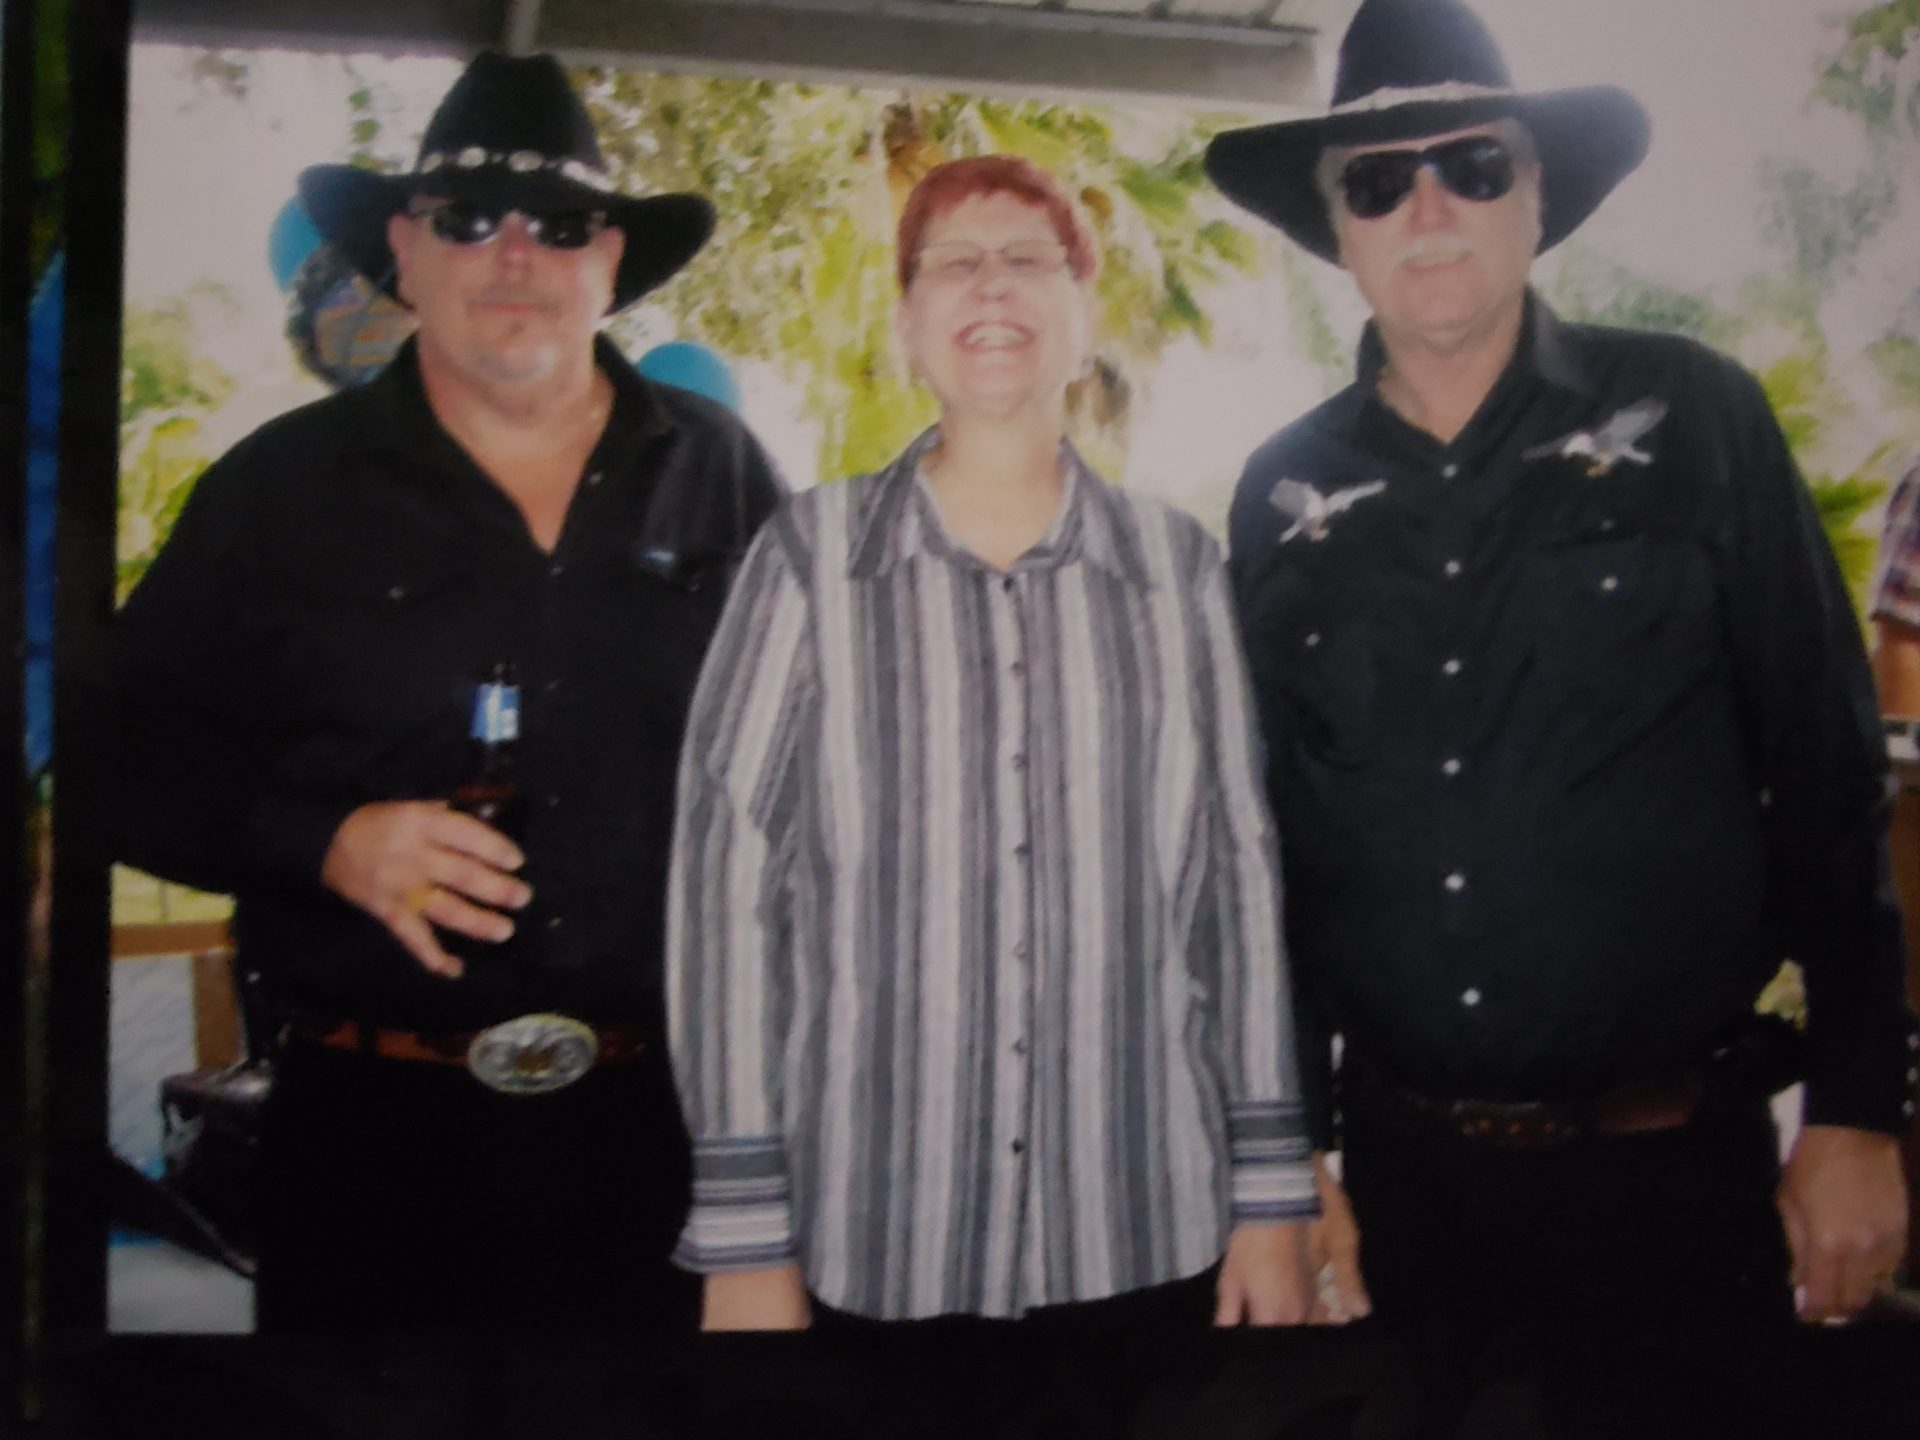 Mike, Debi and James